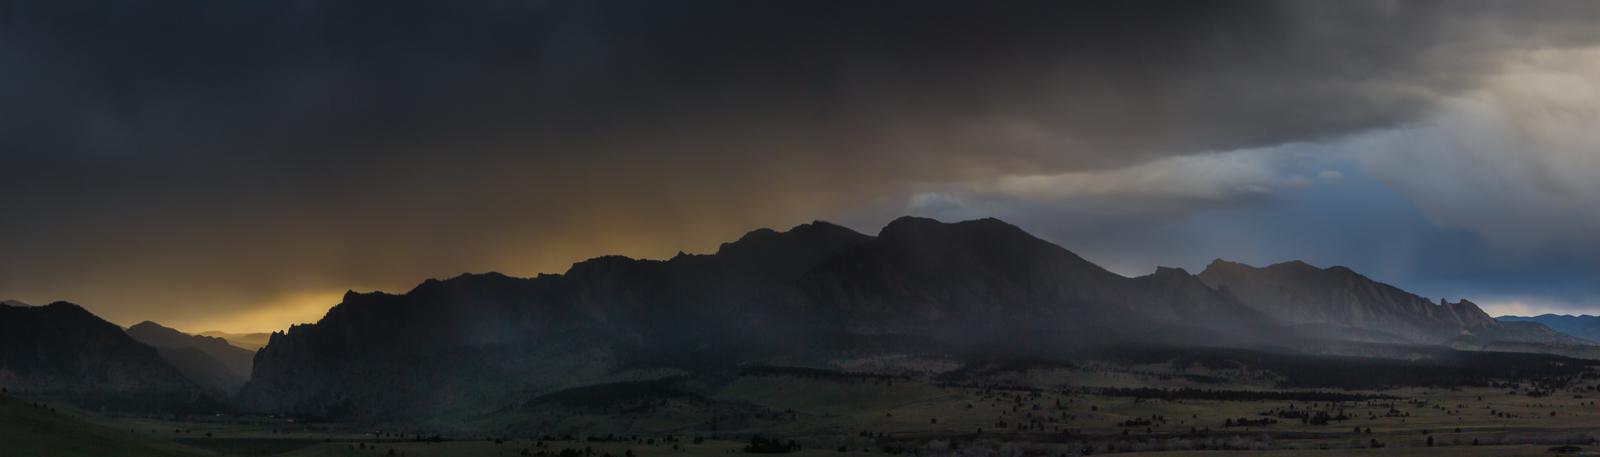 Sunset storm, Boulder Flatirons